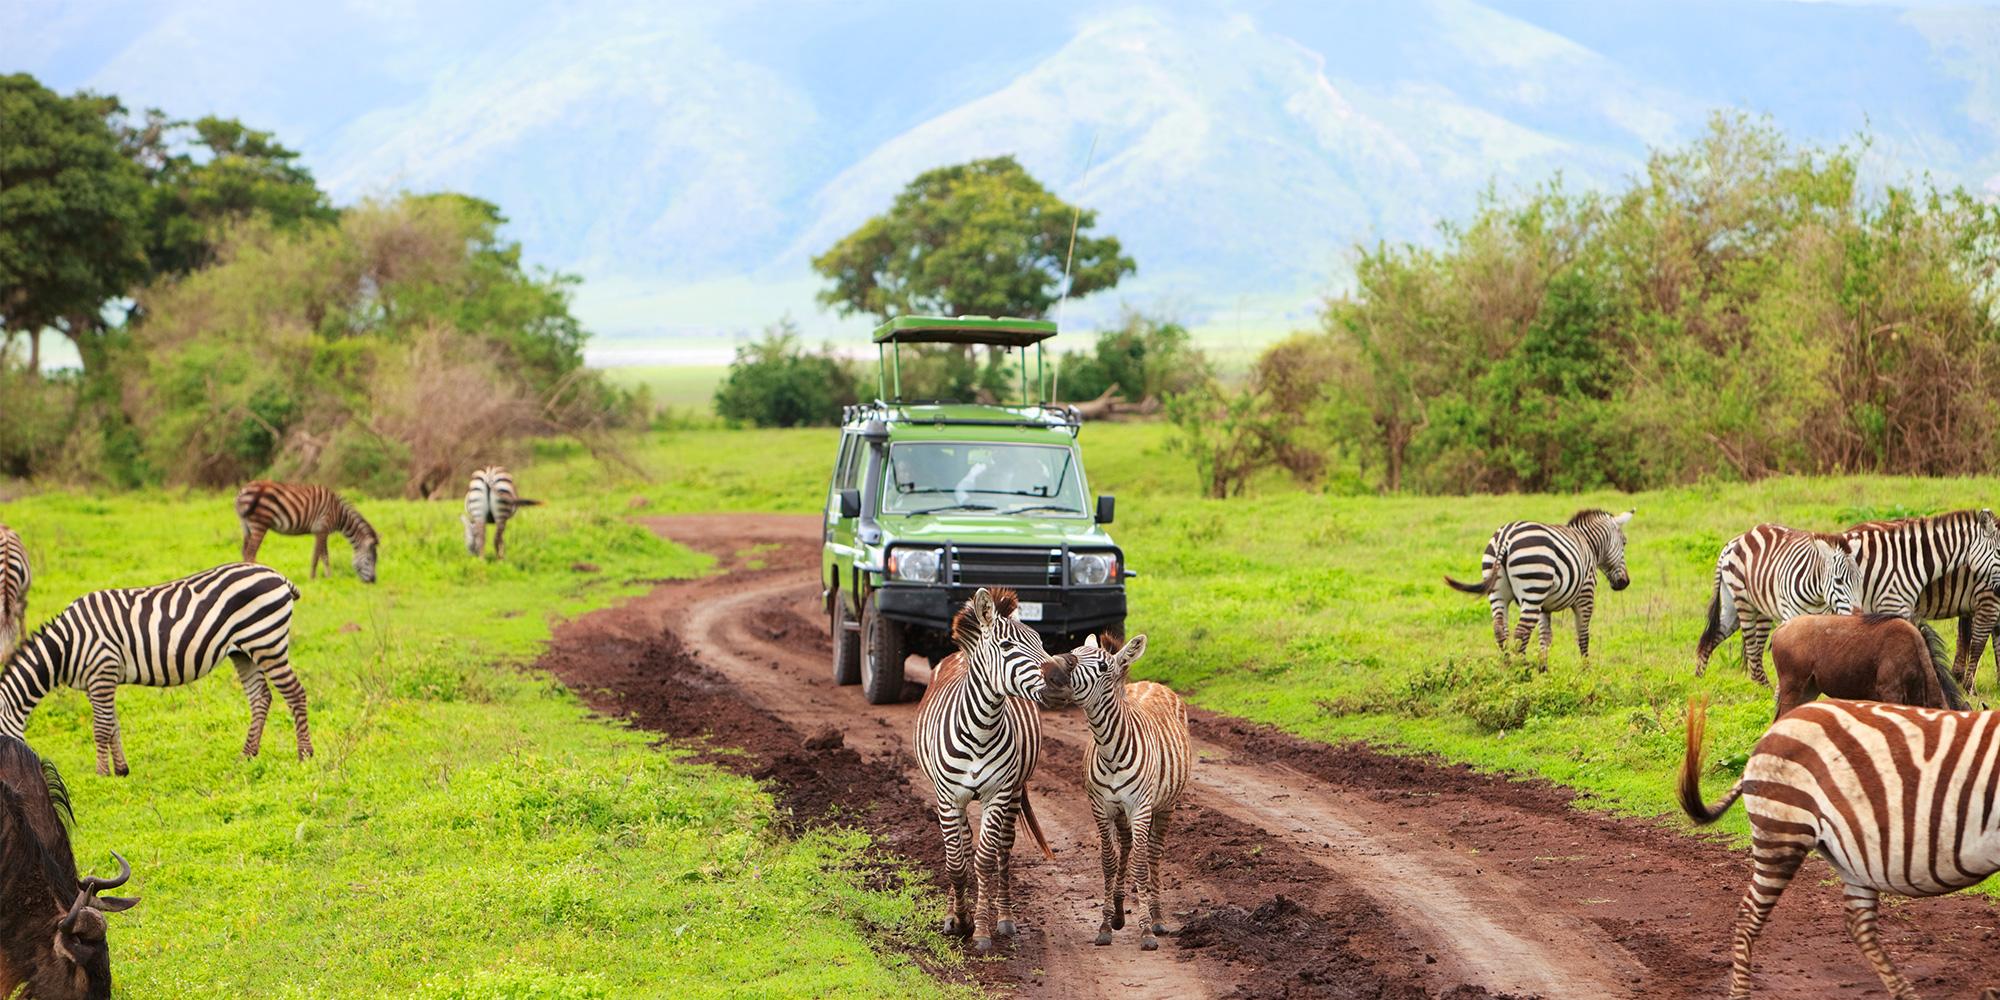 How to be a Good Tourist on Safari